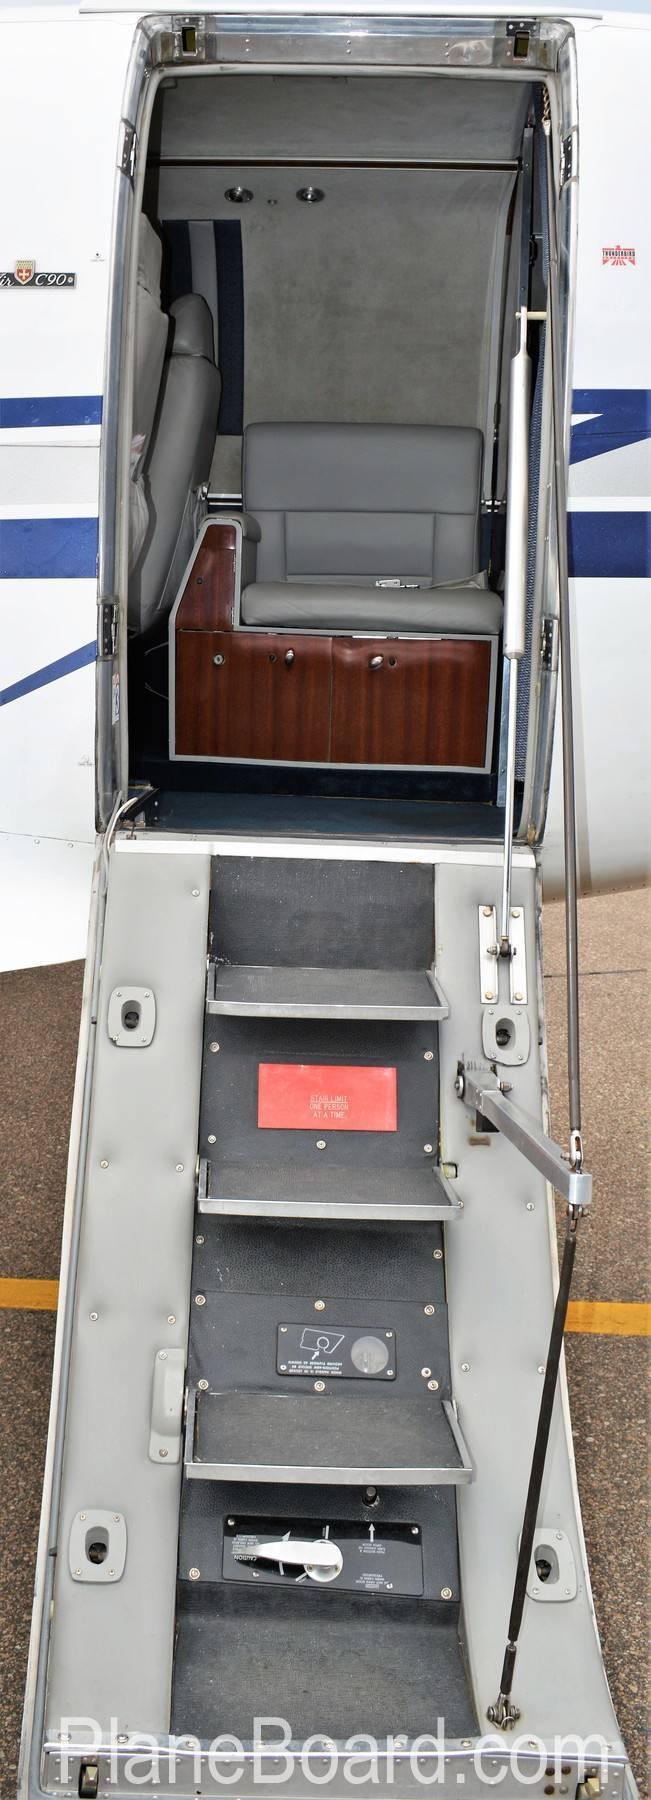 1977 Beechcraft King Air C90 exterior 1